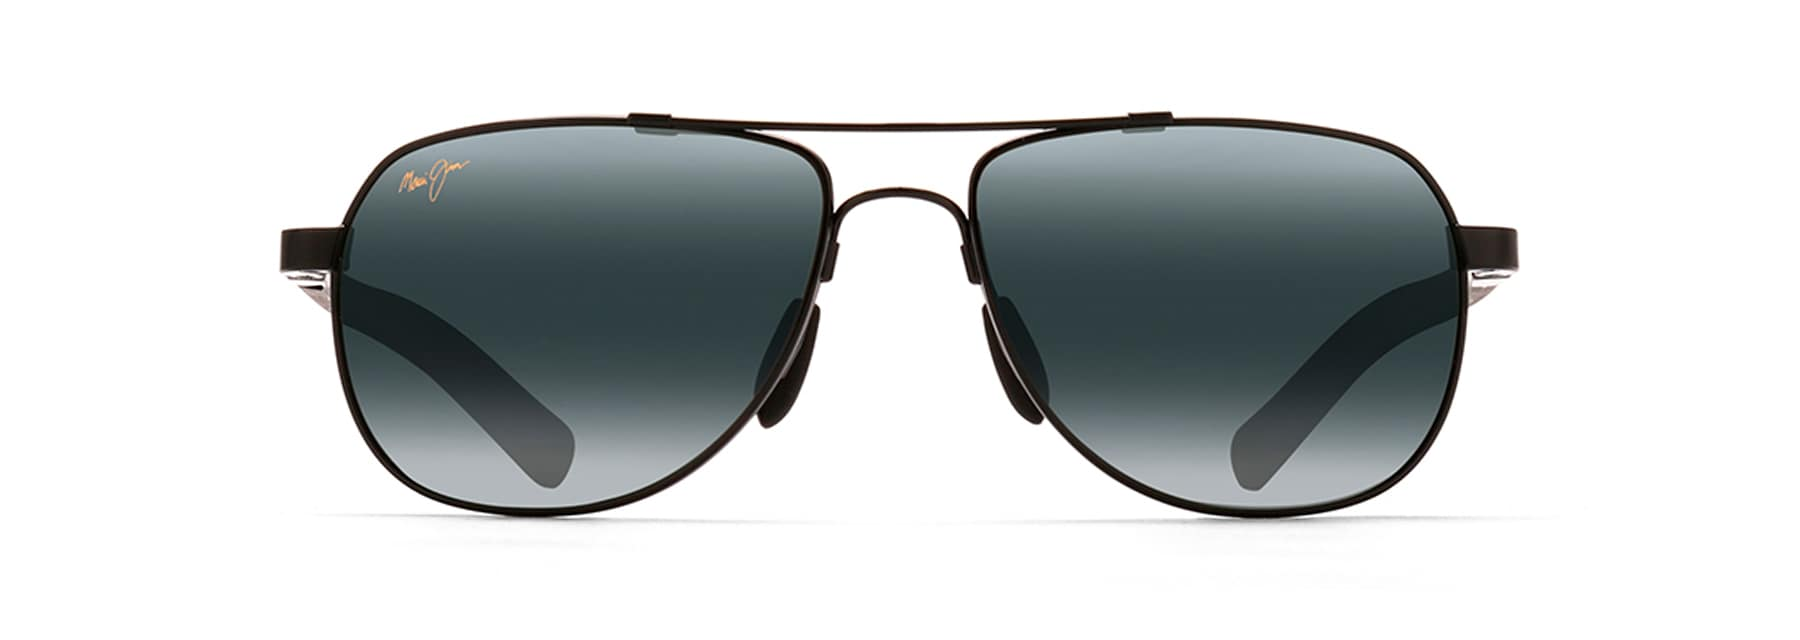 Guardrails SunglassesMaui Polarized Jim® Polarized Guardrails WD2IYEH9